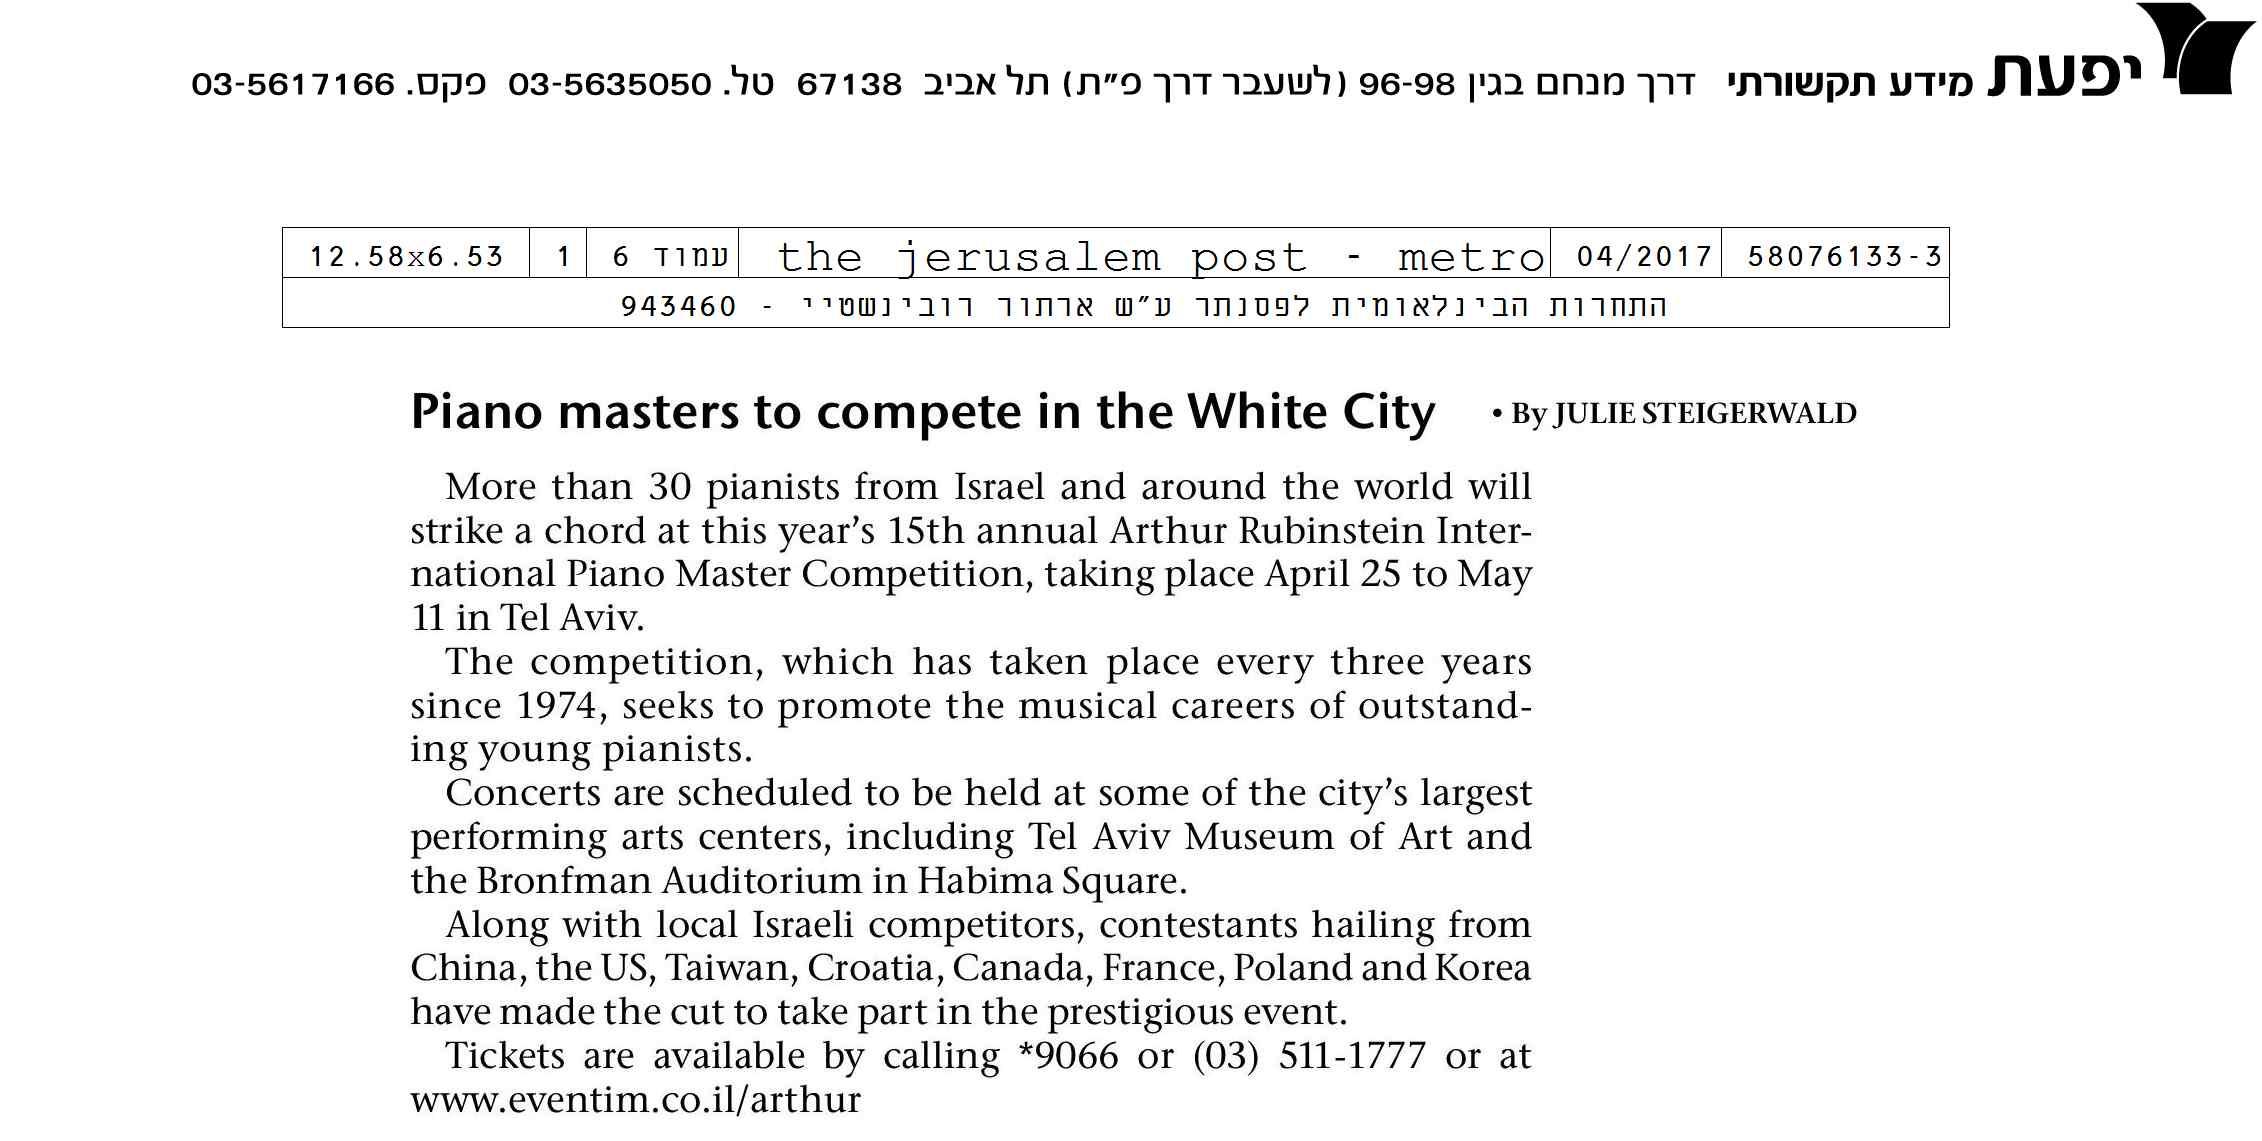 http://arims.org.il/wp-content/uploads/2018/05/Jerusalem-Post-Metro-04.2017.jpg